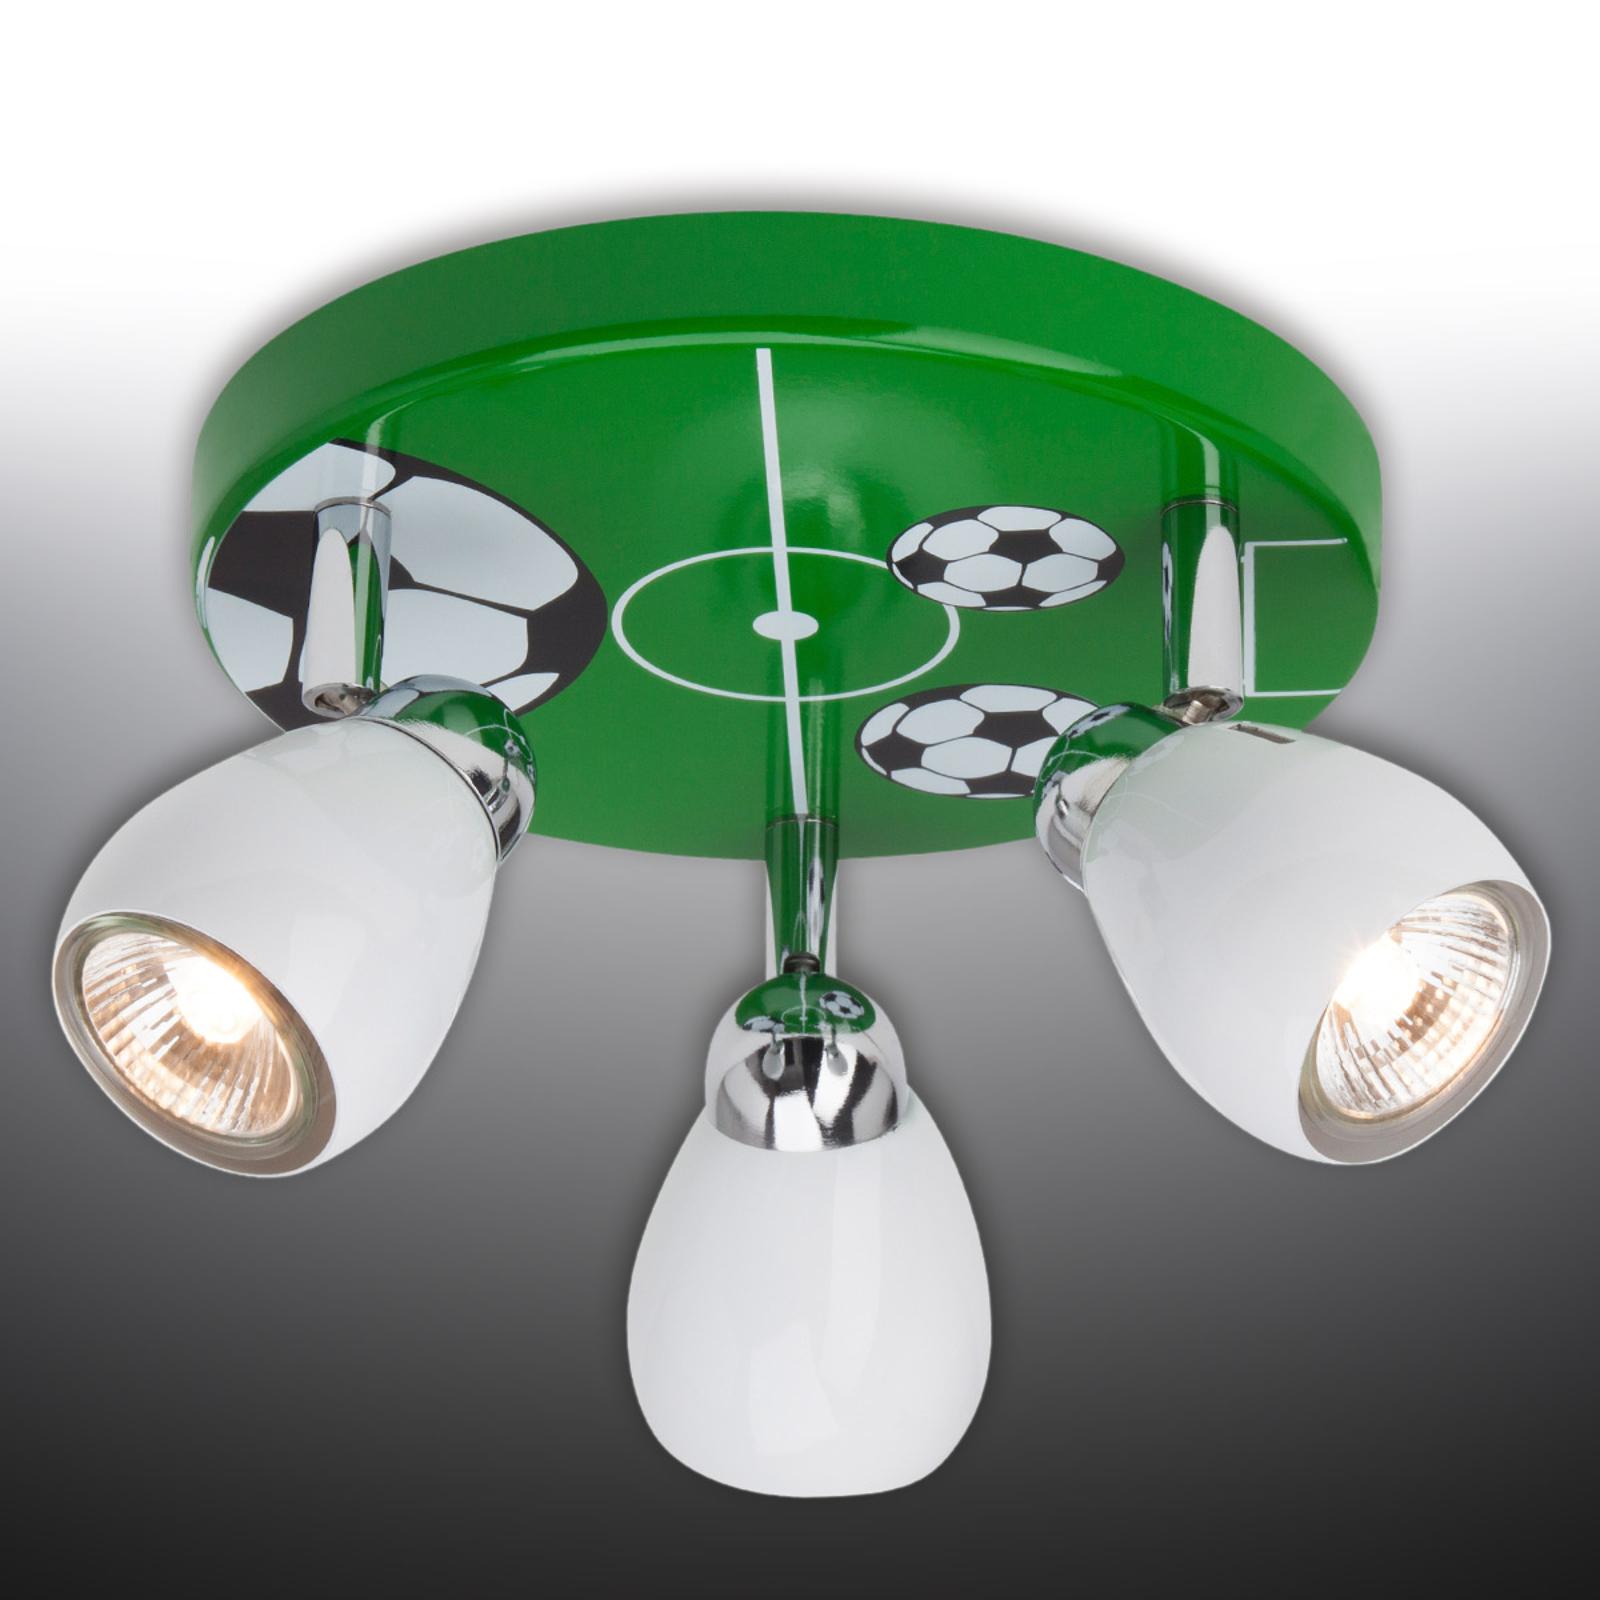 LED-Deckenleuchte Soccer, dreiflammig